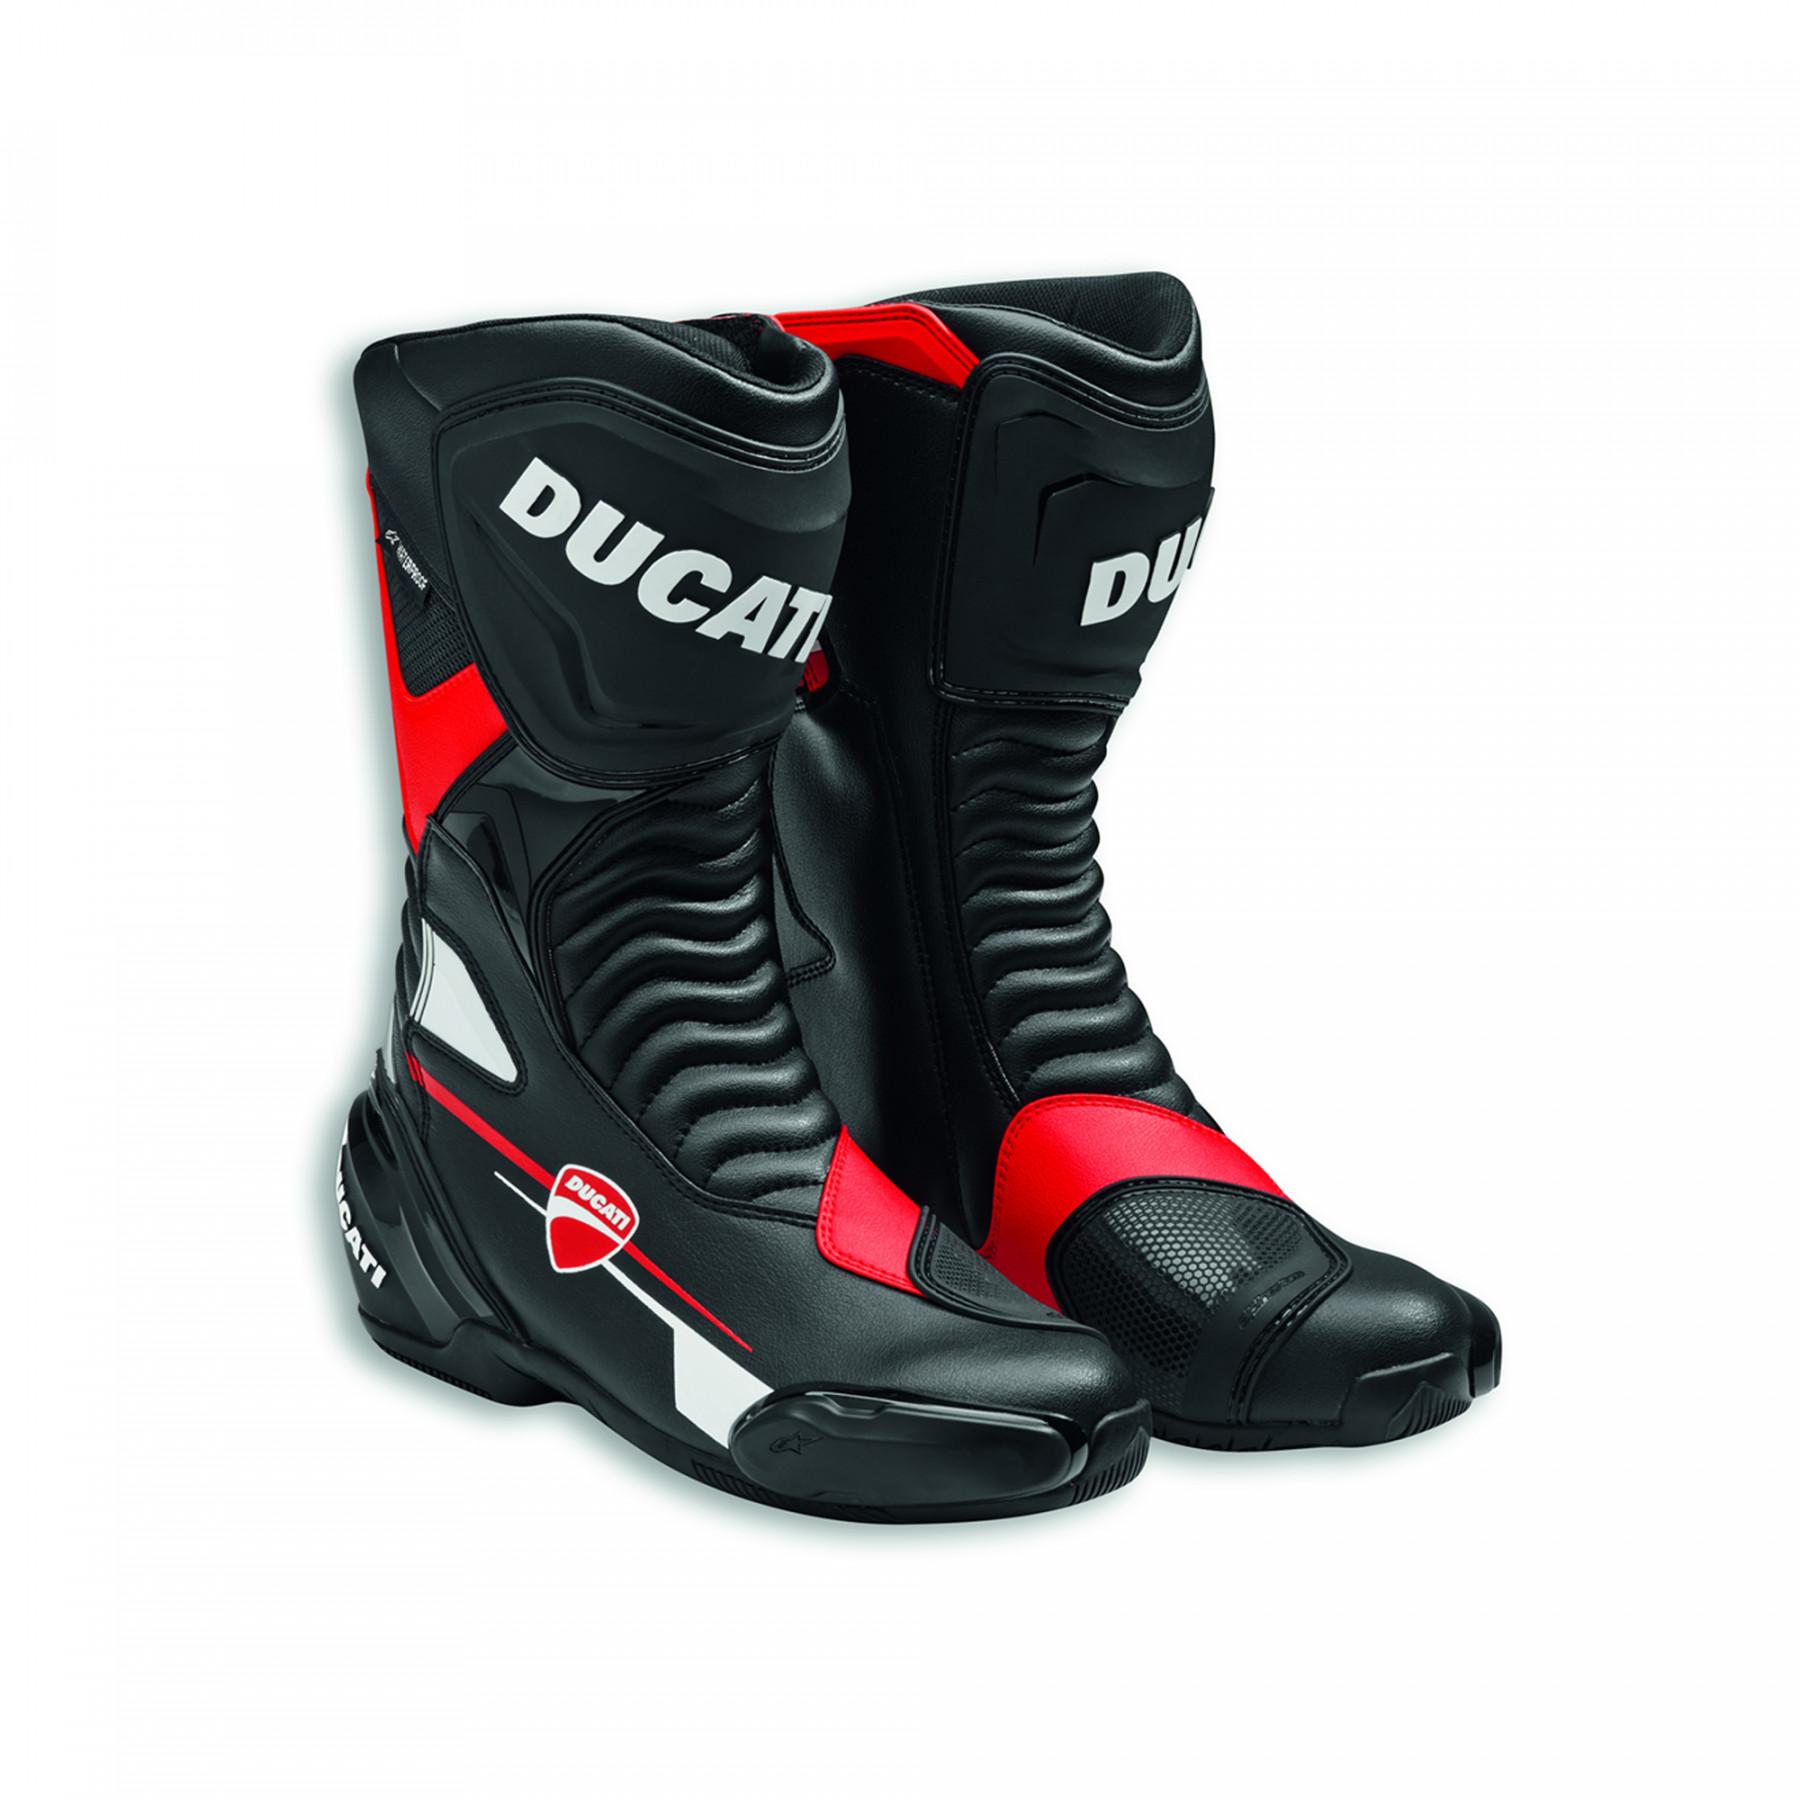 Ducati Laars Sport-Touring C1 WP